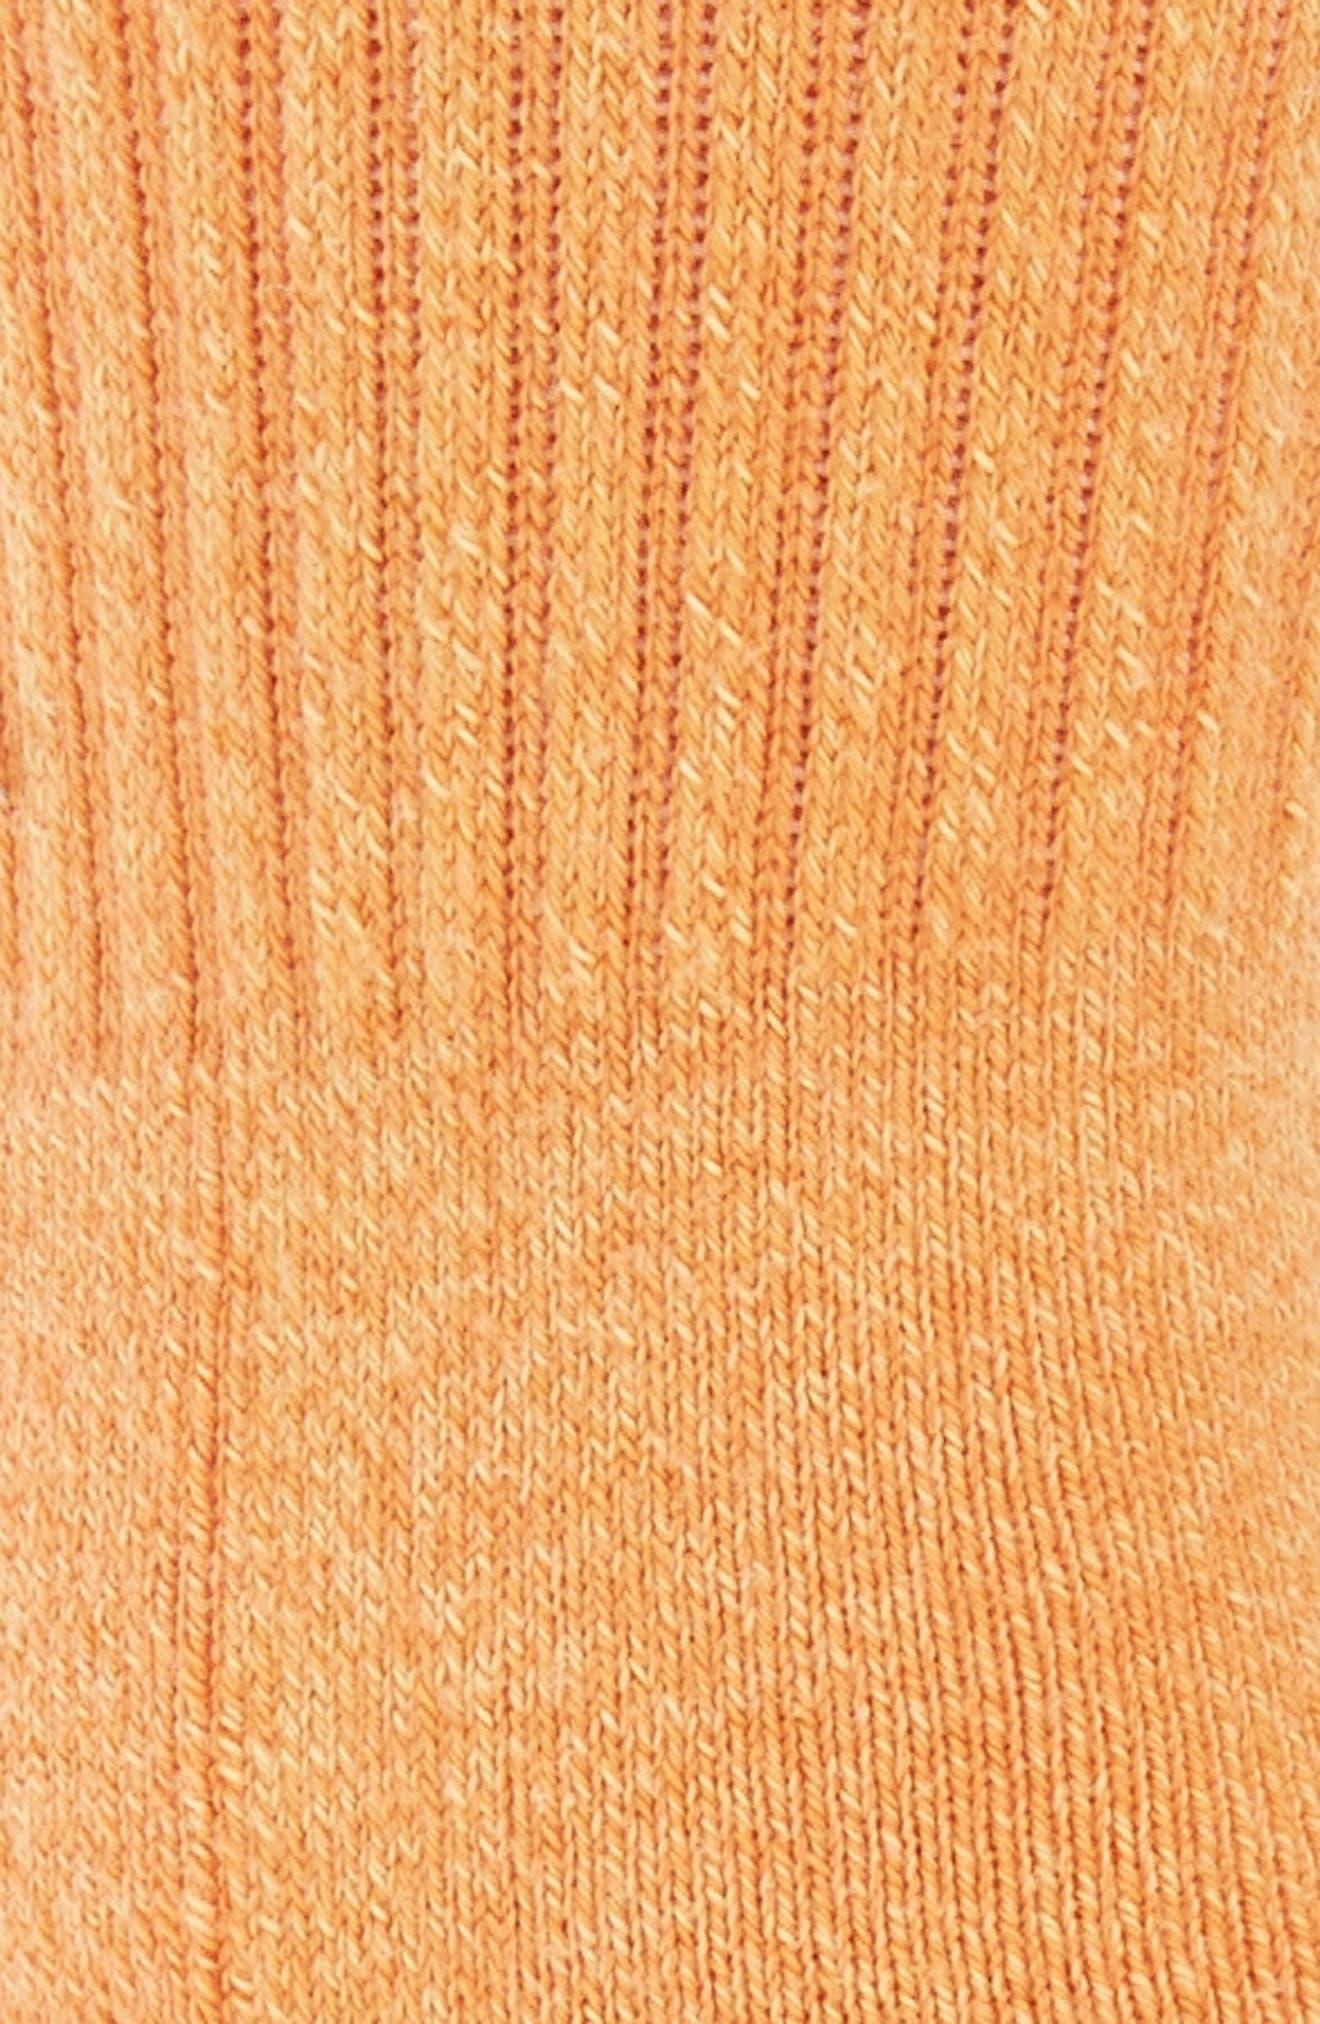 Salty Crew Socks,                             Alternate thumbnail 2, color,                             810